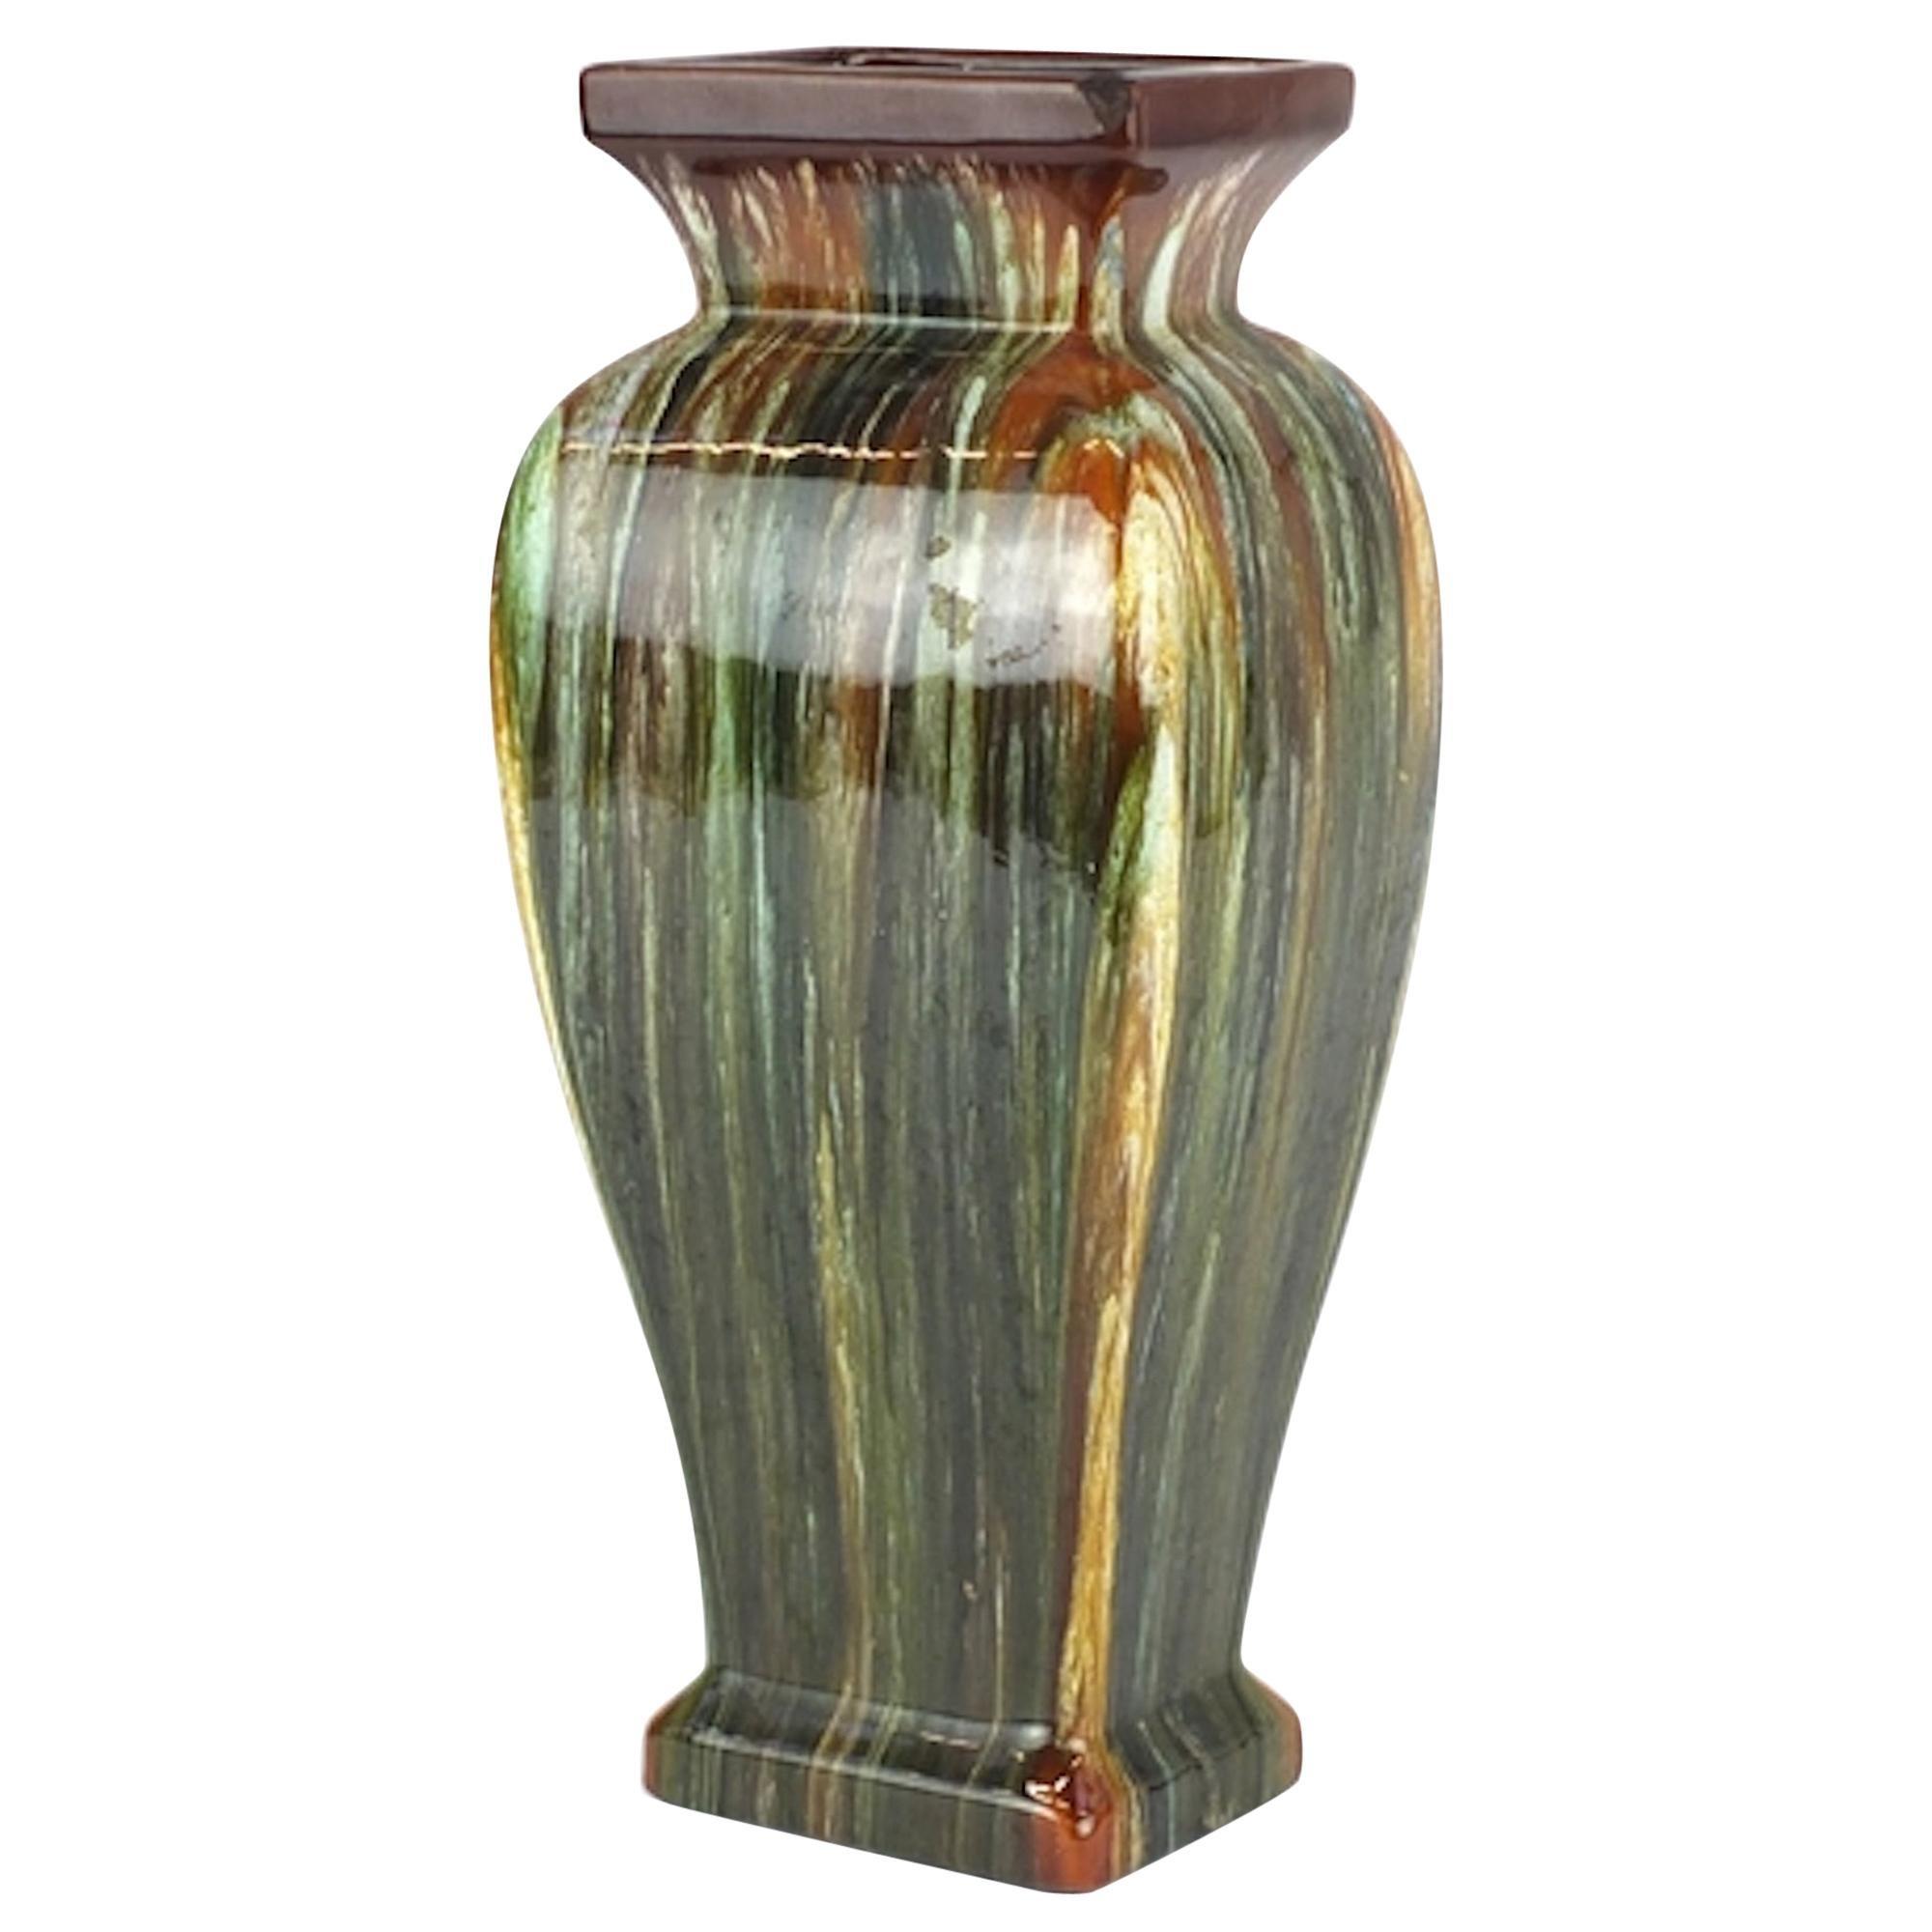 Art Nouveau Bretby Vase, Early 20th Century